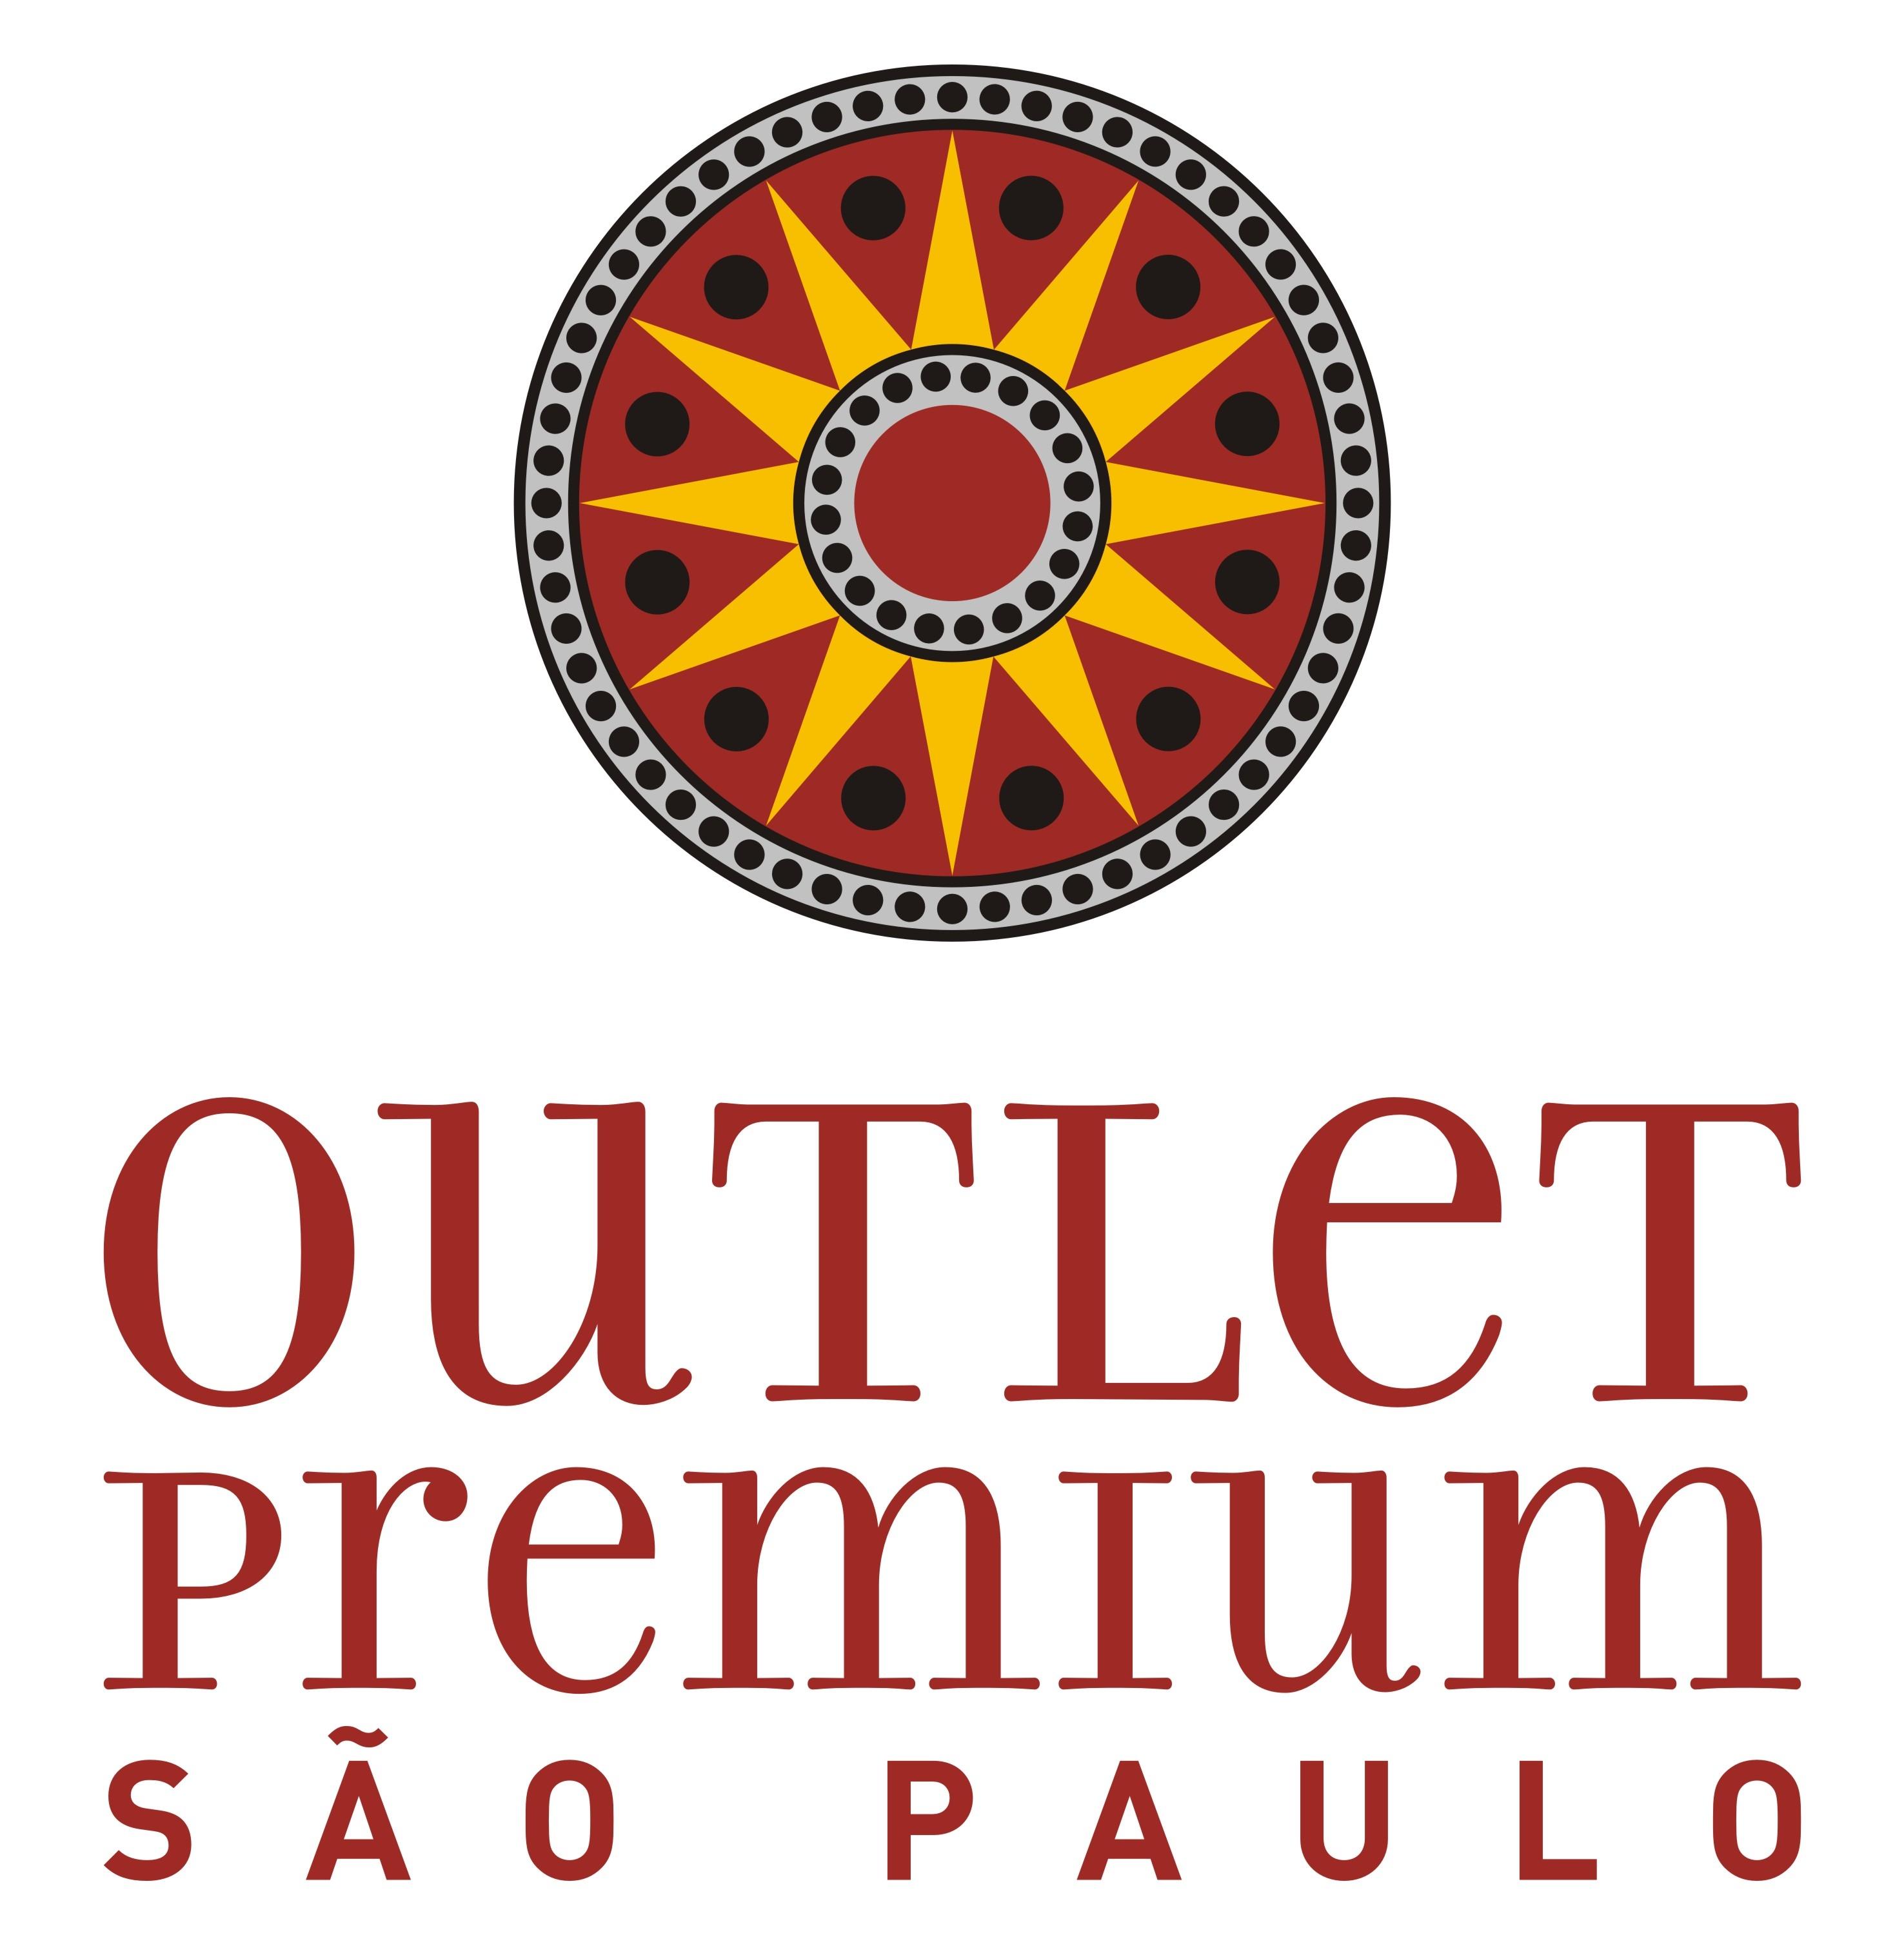 Outlet Premium Campinas